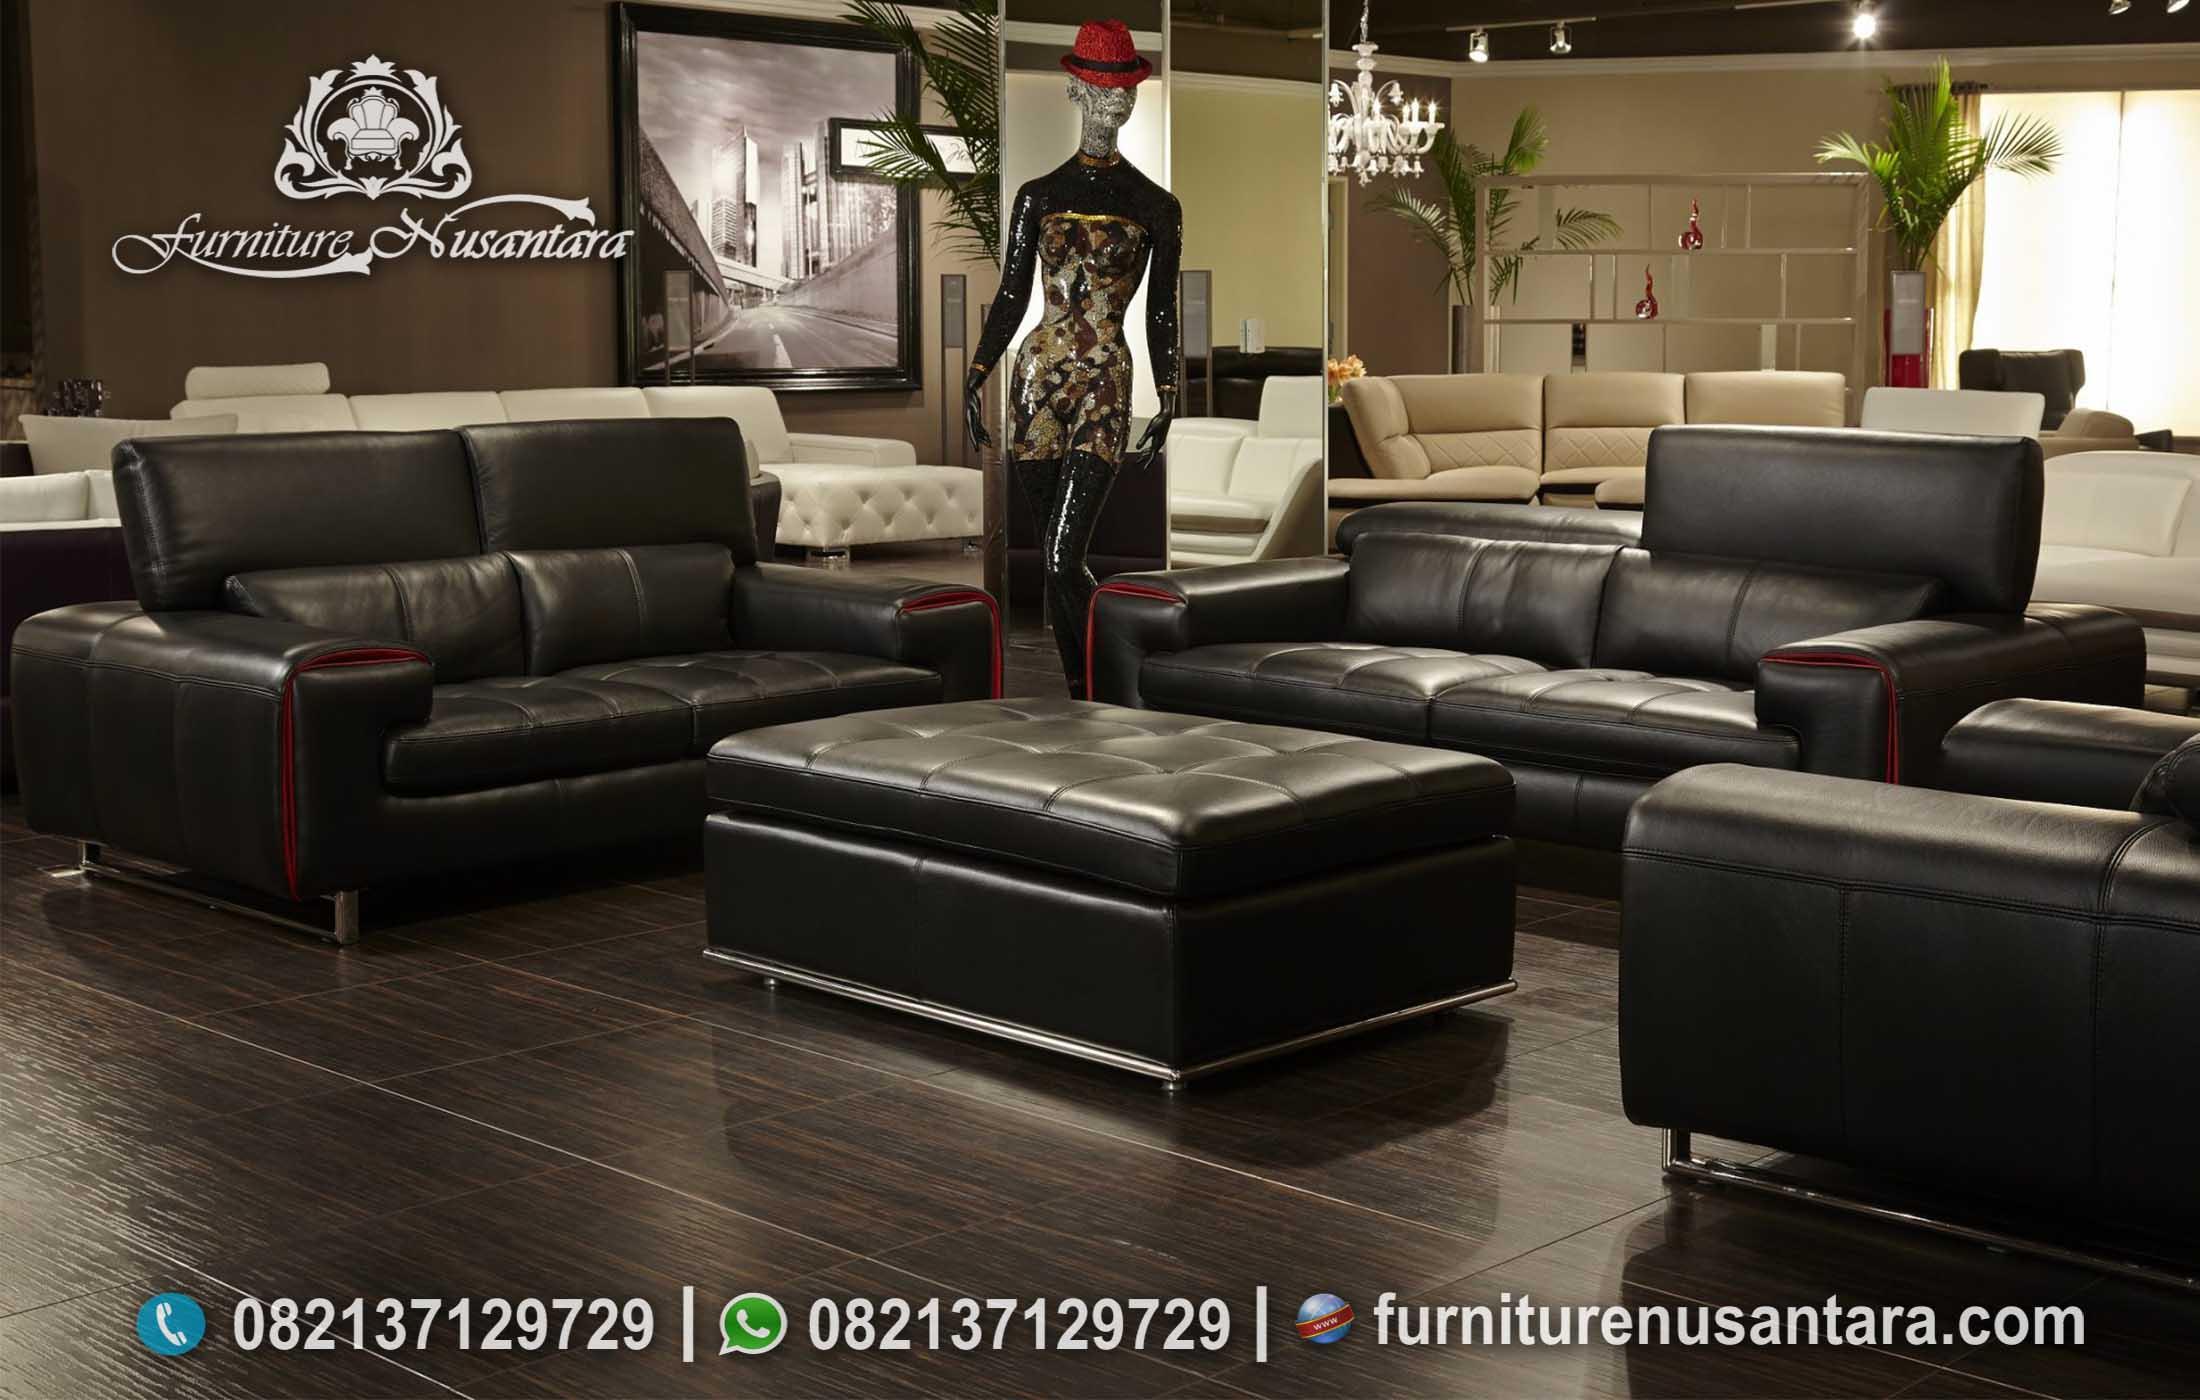 Sofa Minimalis Italian Leather Modern ST-92, Furniture Nusantara